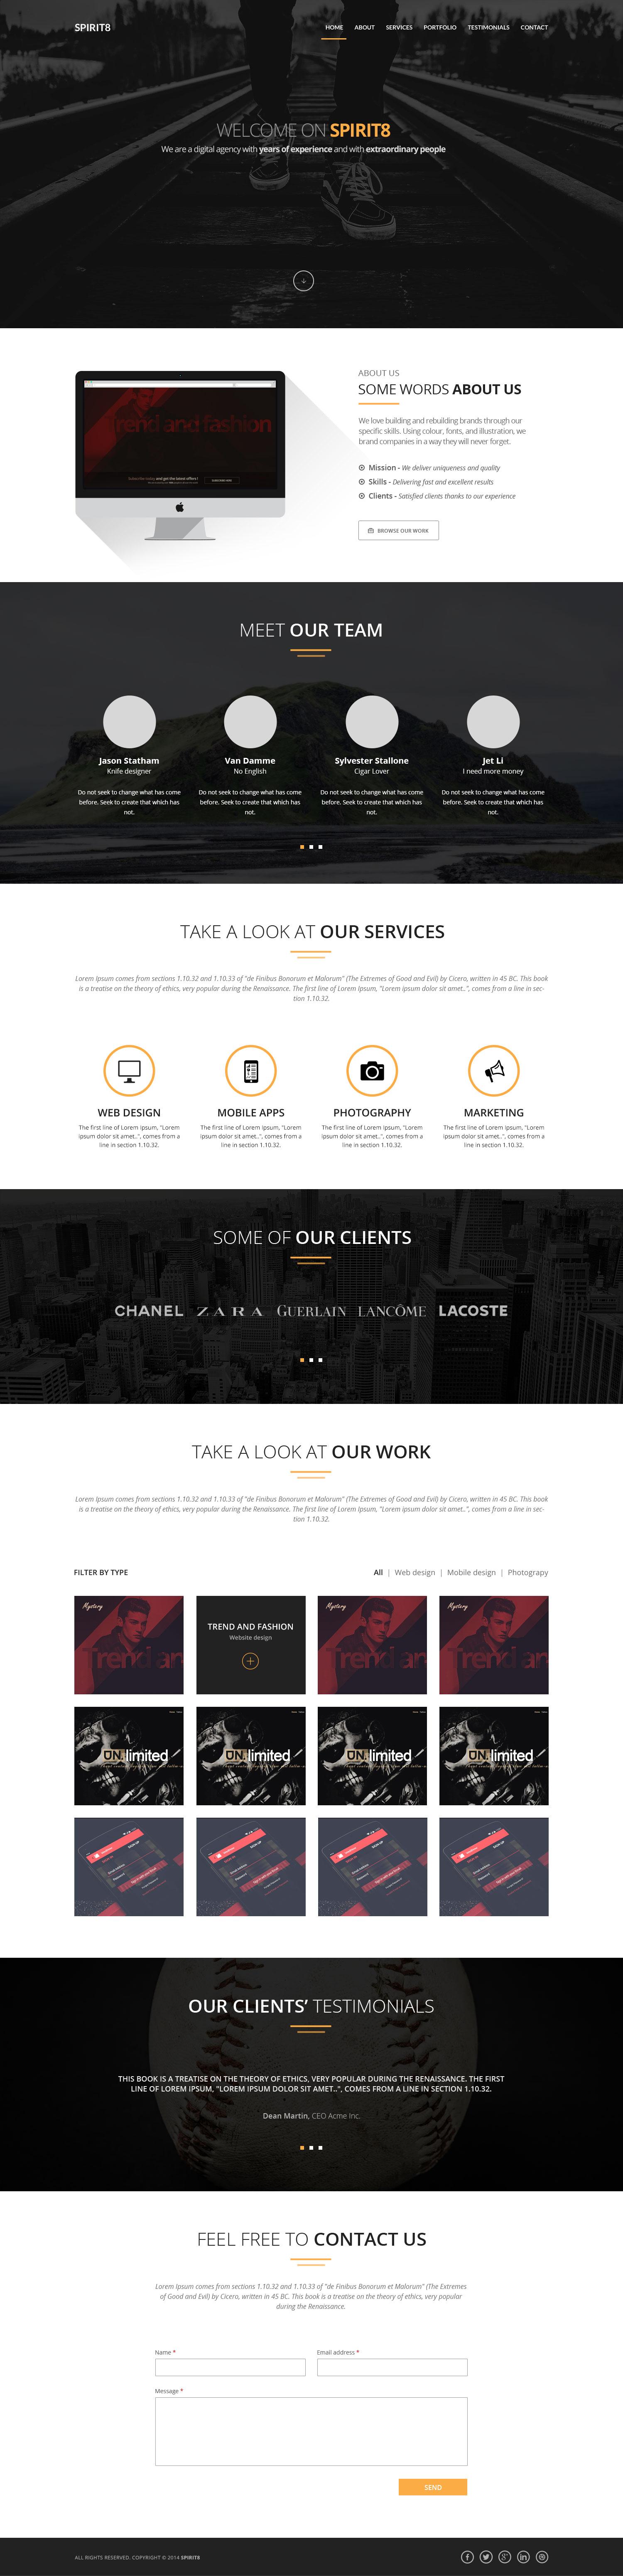 spirit8 digital agency one page web template free html5 templates. Black Bedroom Furniture Sets. Home Design Ideas